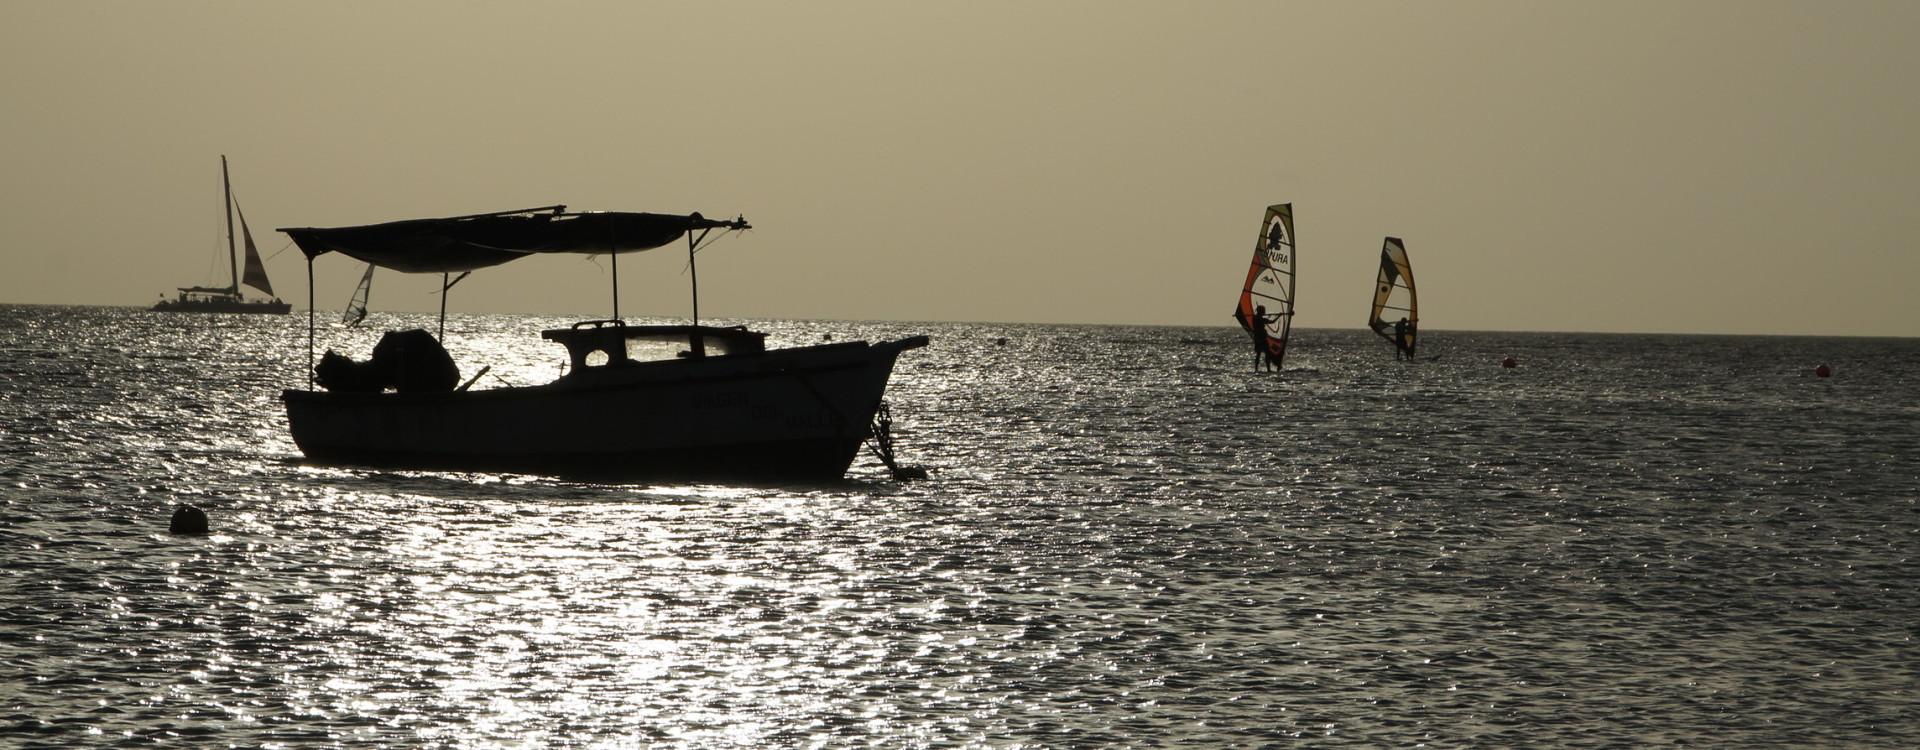 Aruba Watercraft